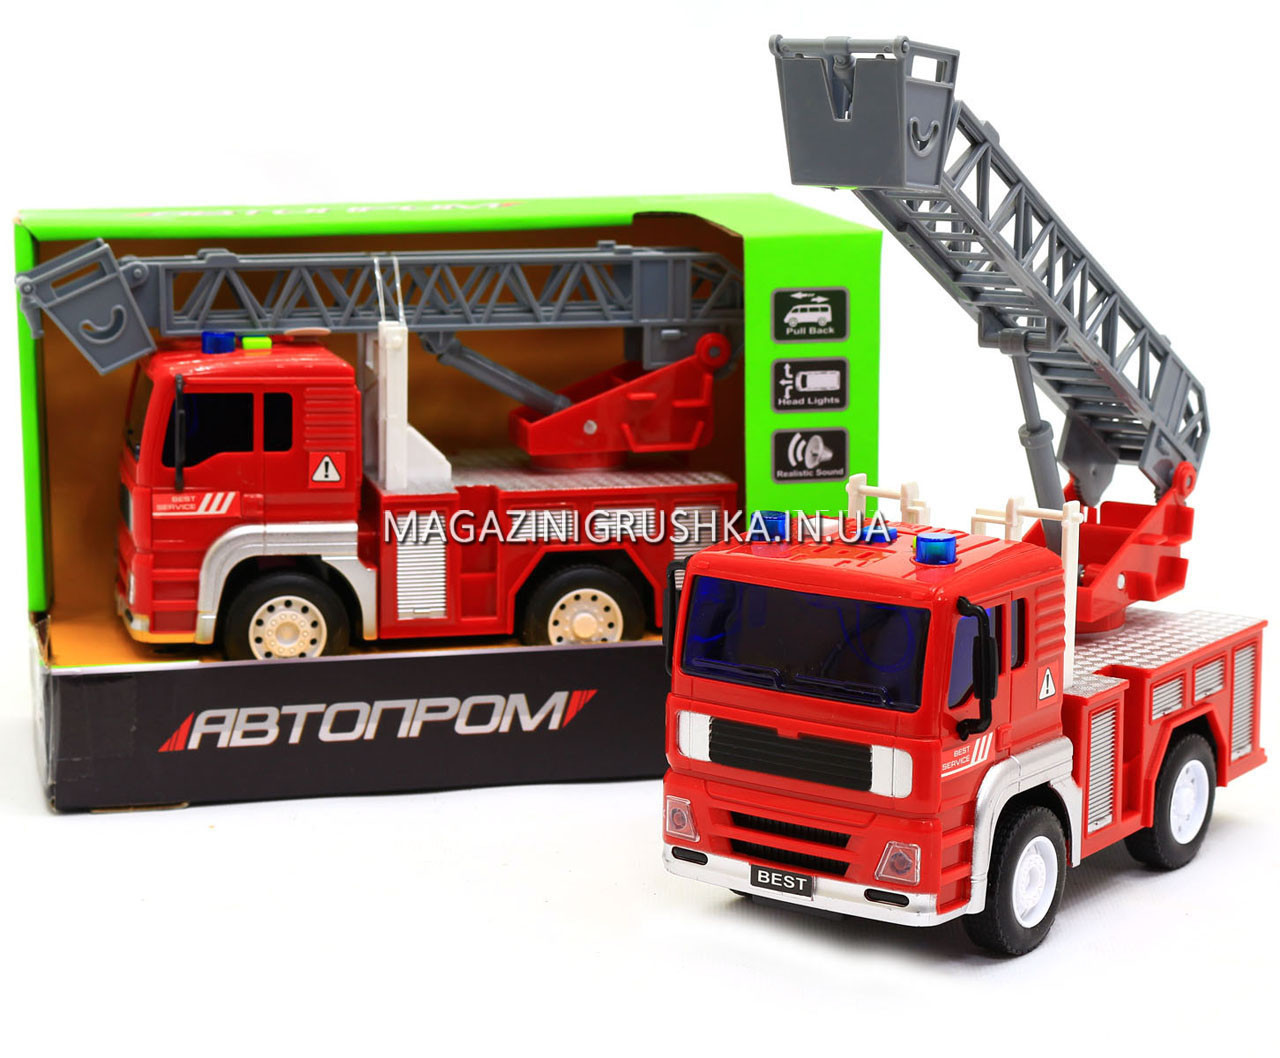 Машинка ігрова автопром «Пожежна машина» (світло, звук) 7815